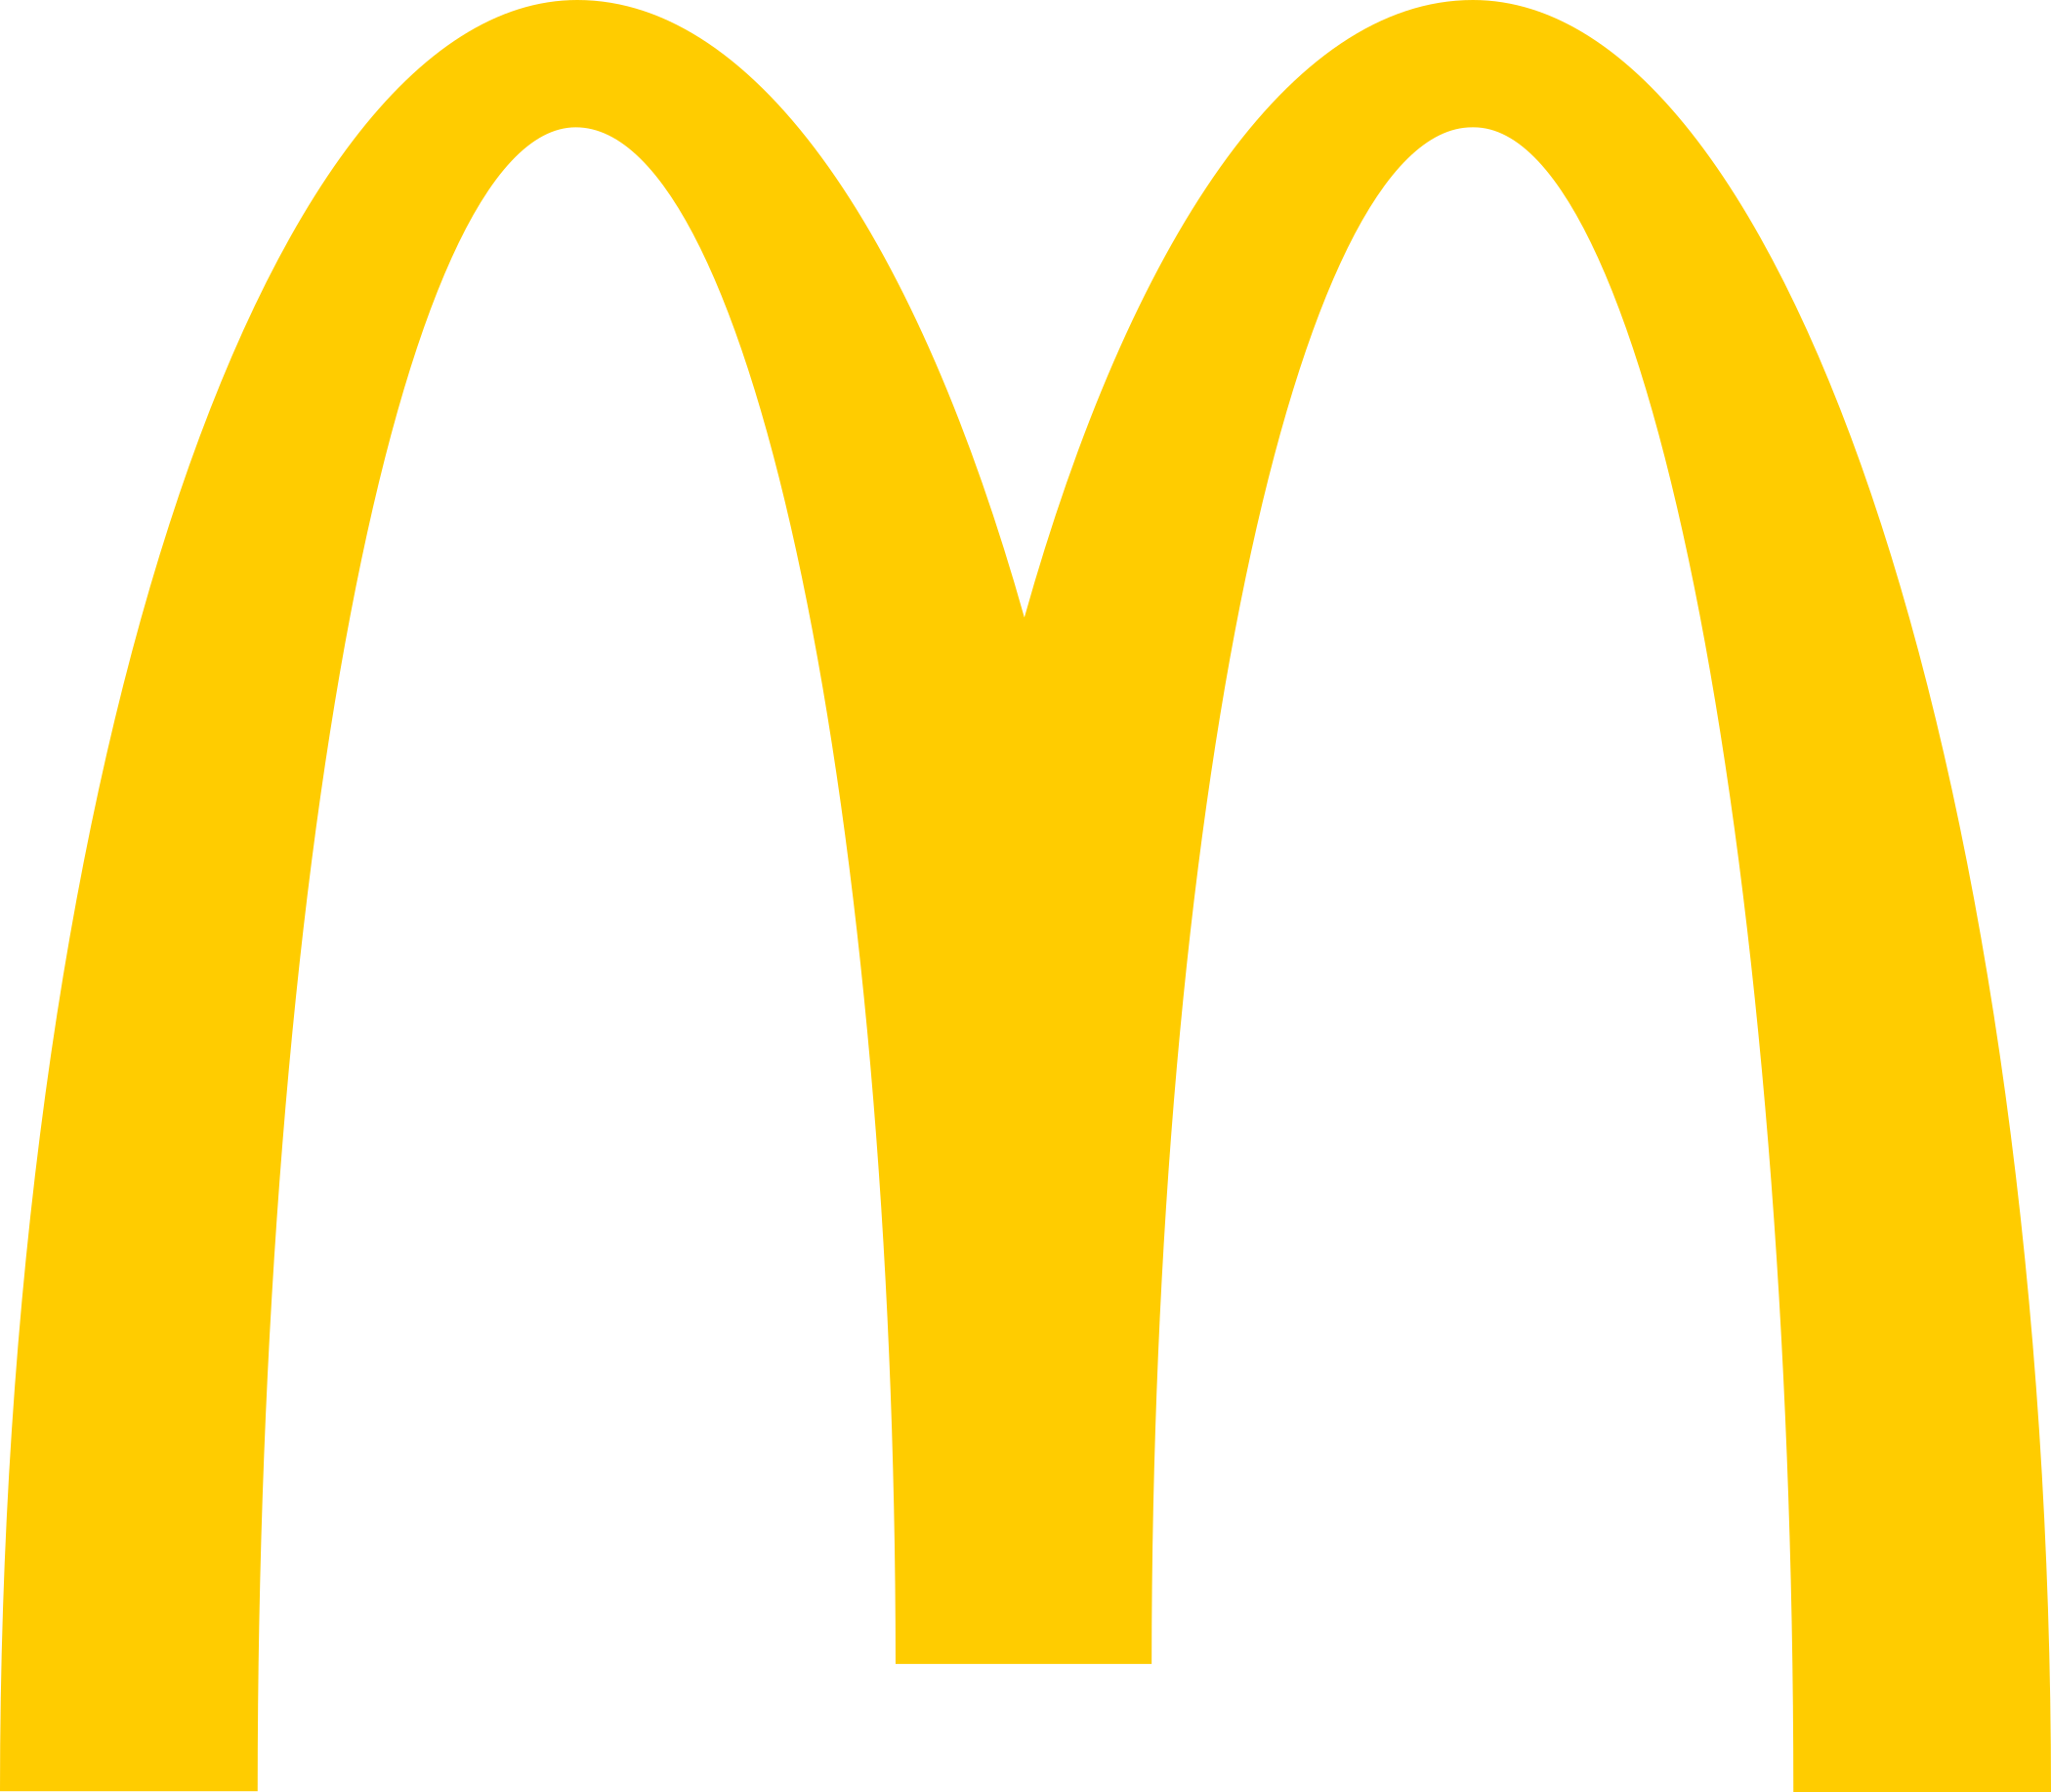 McDonalds logo 2 - McDonald's Logo